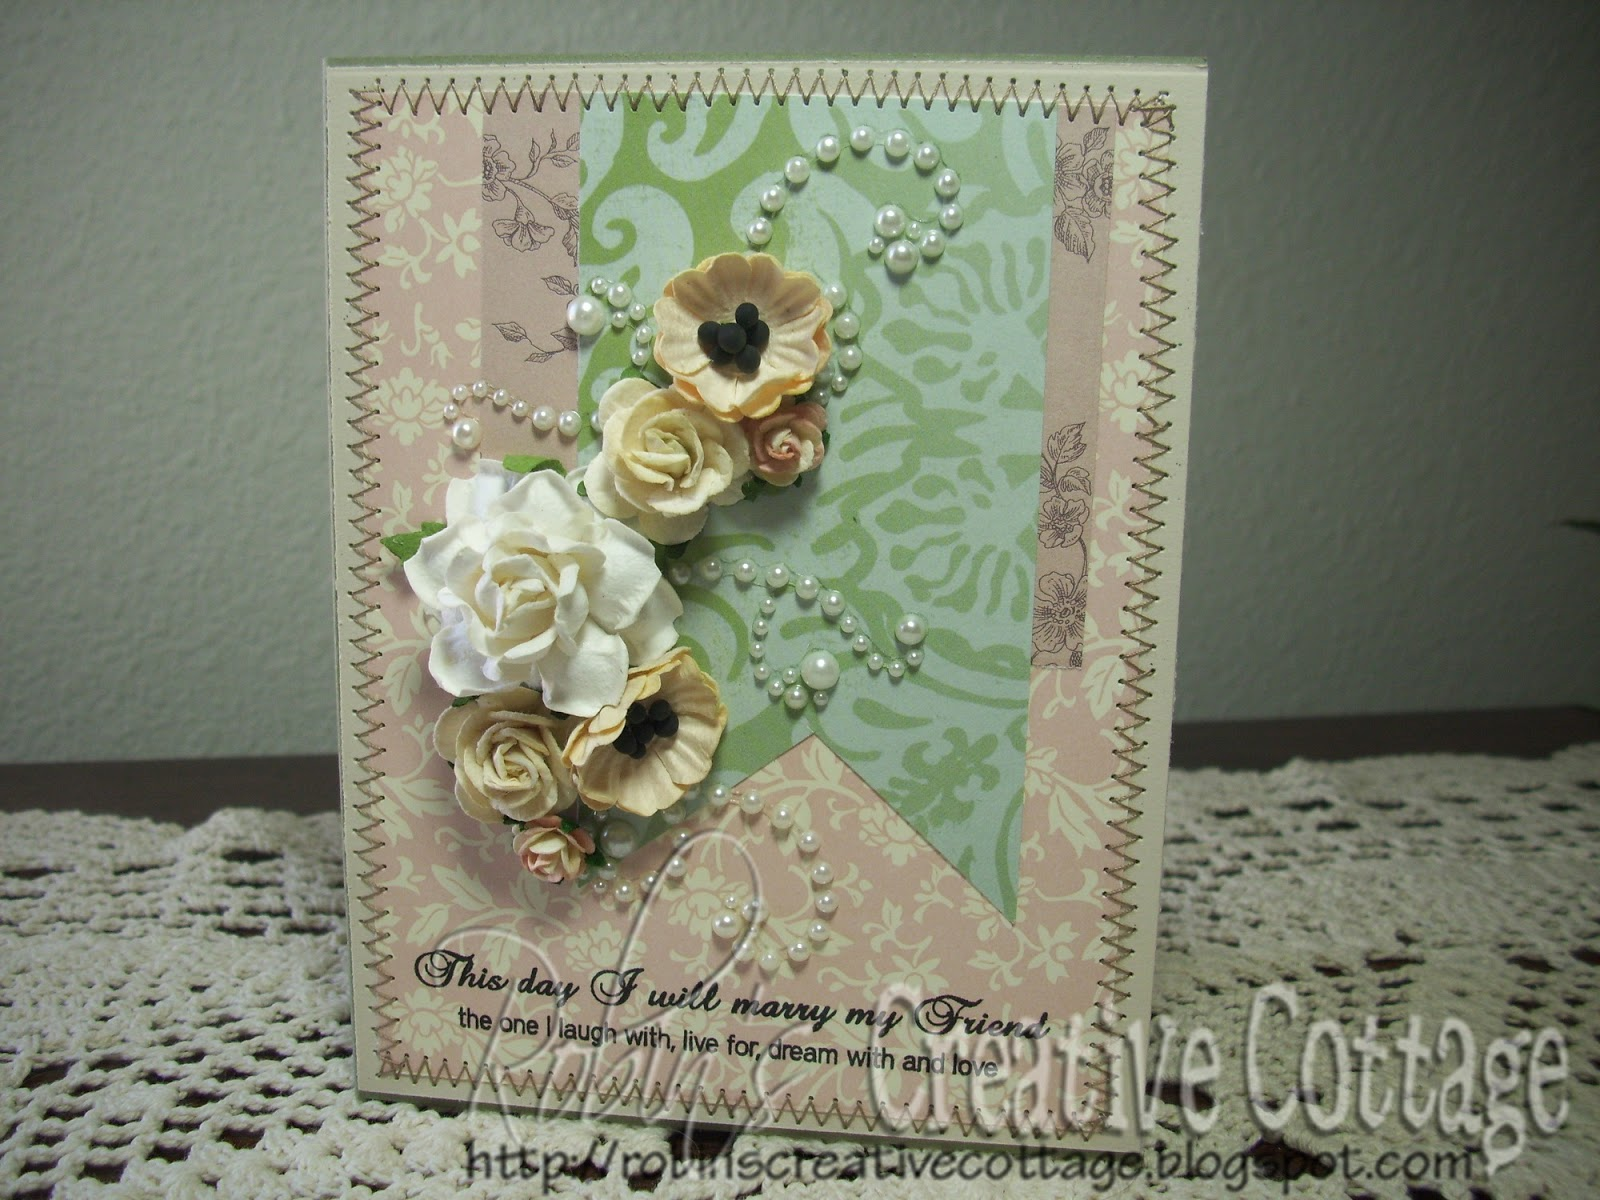 robin's creative cottage beautiful wedding card